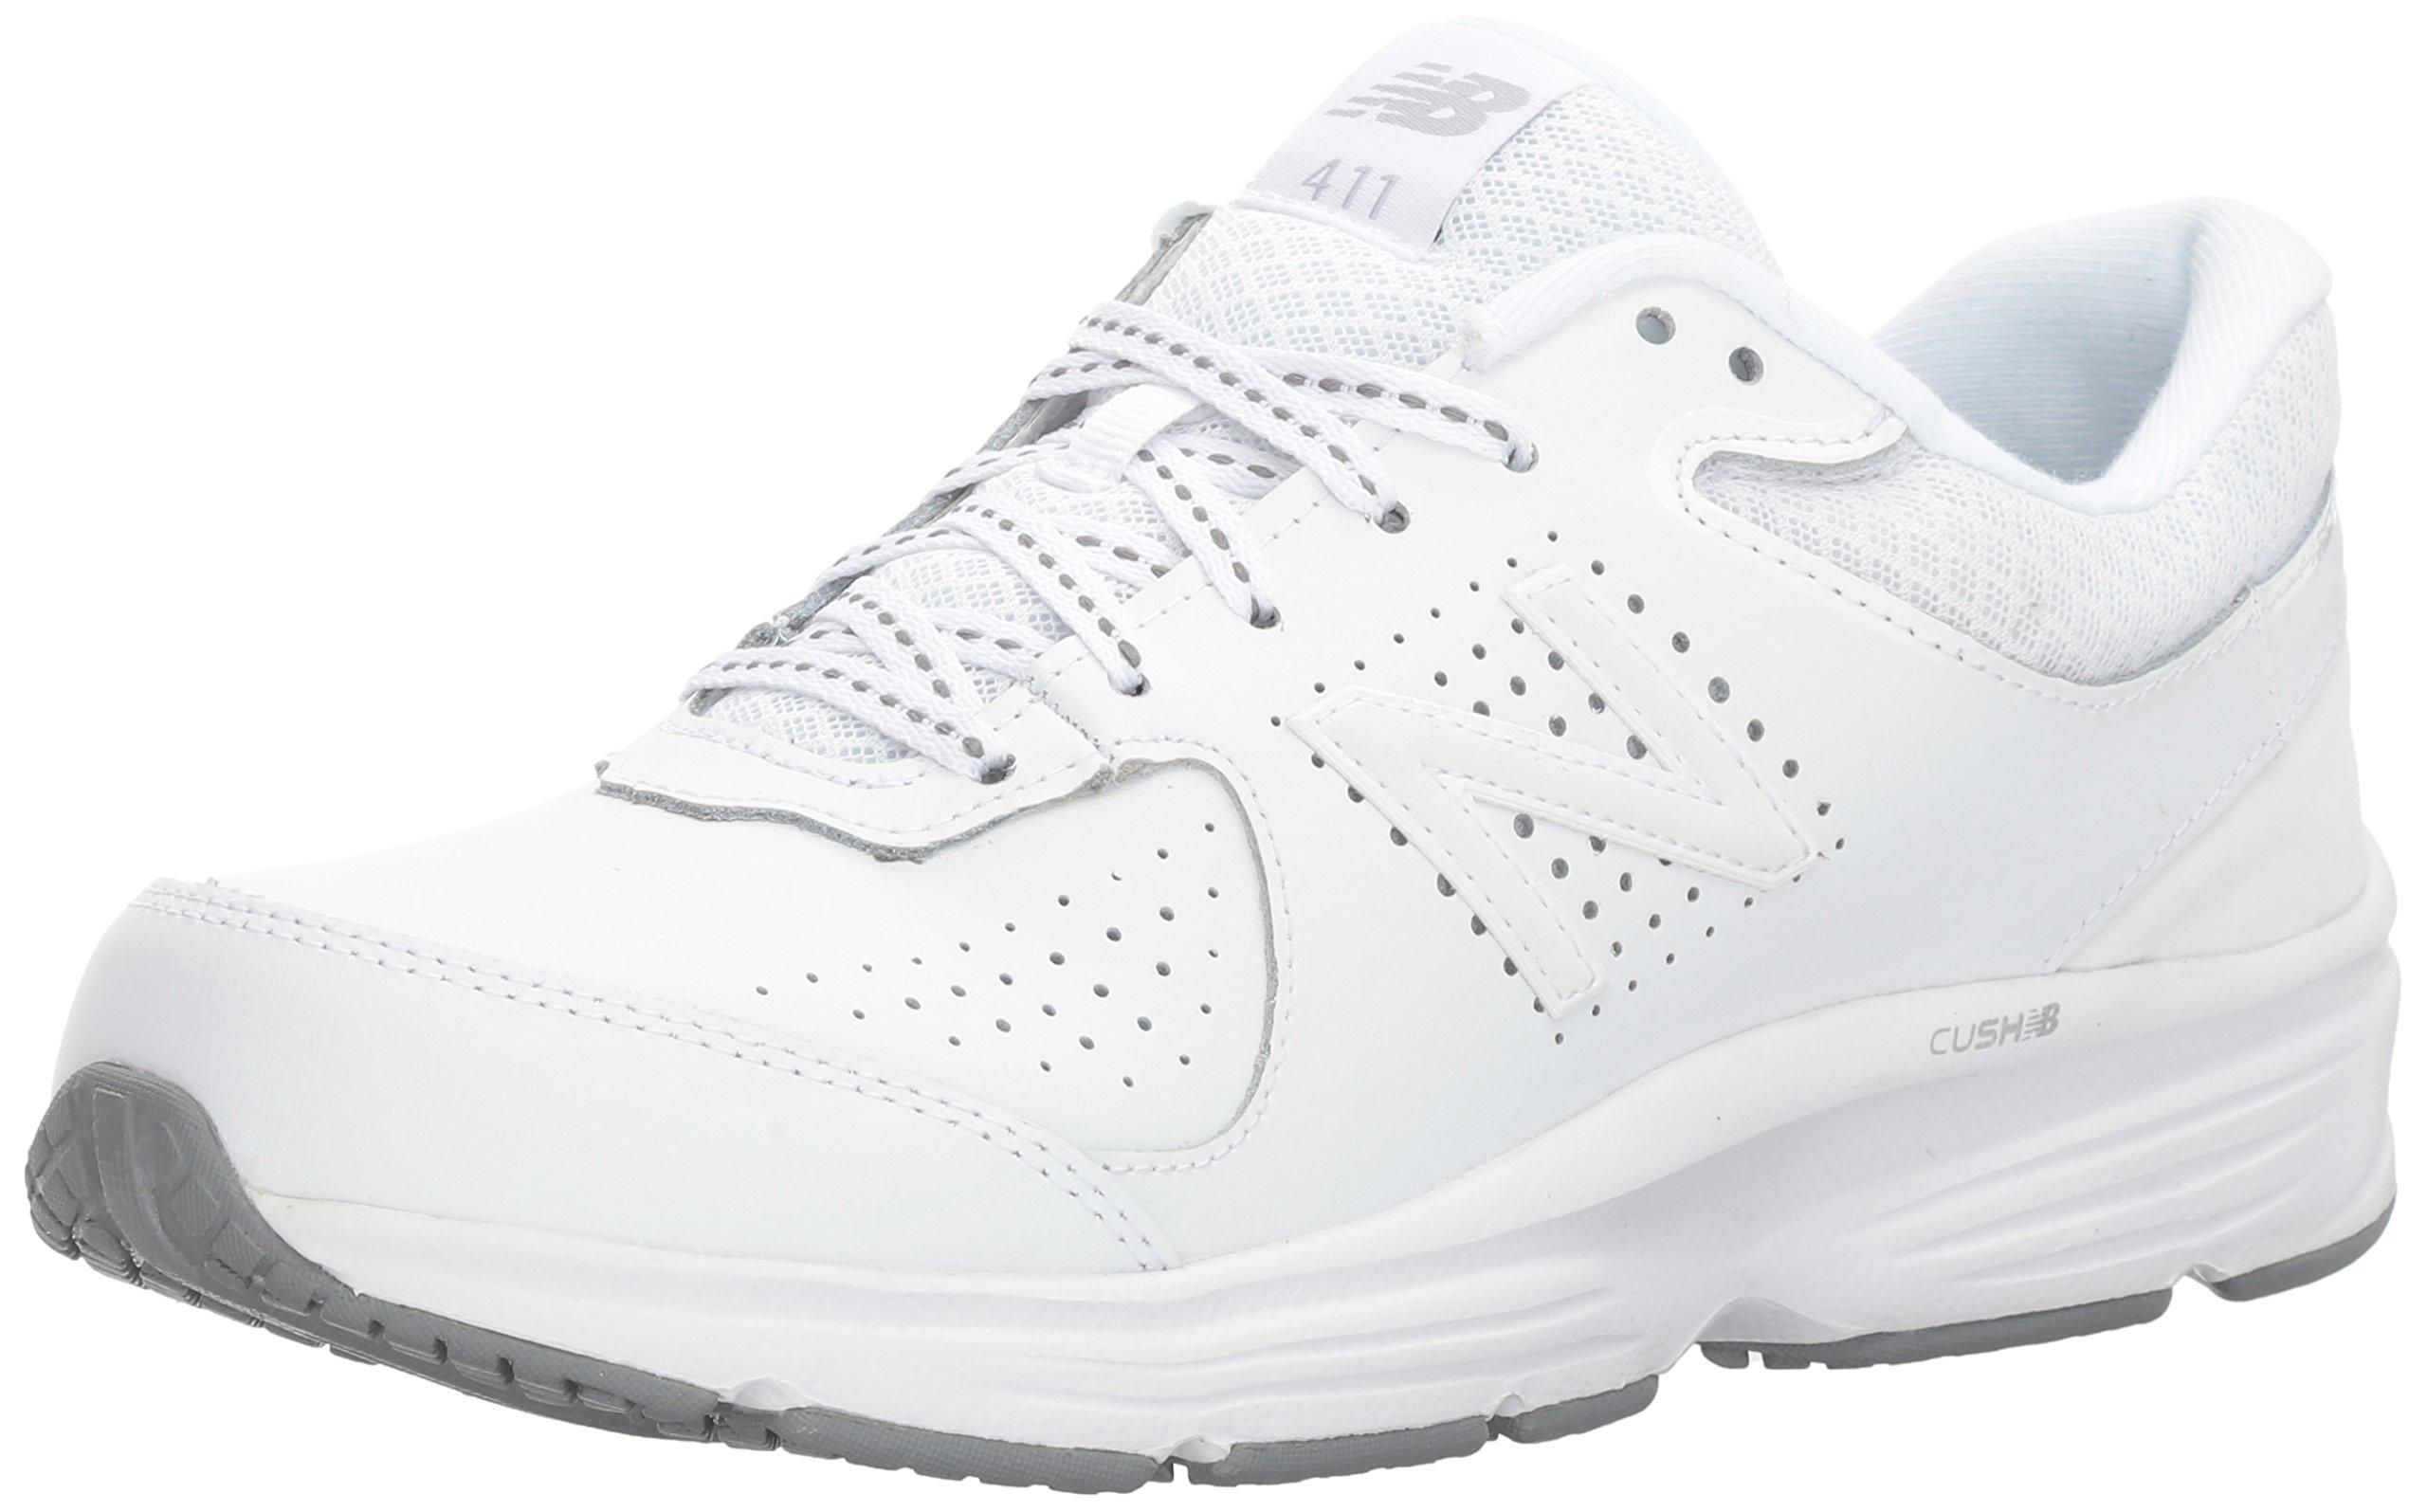 New Balance Women's WW411v2 Walking Shoe, White, 7.5 D US by New Balance